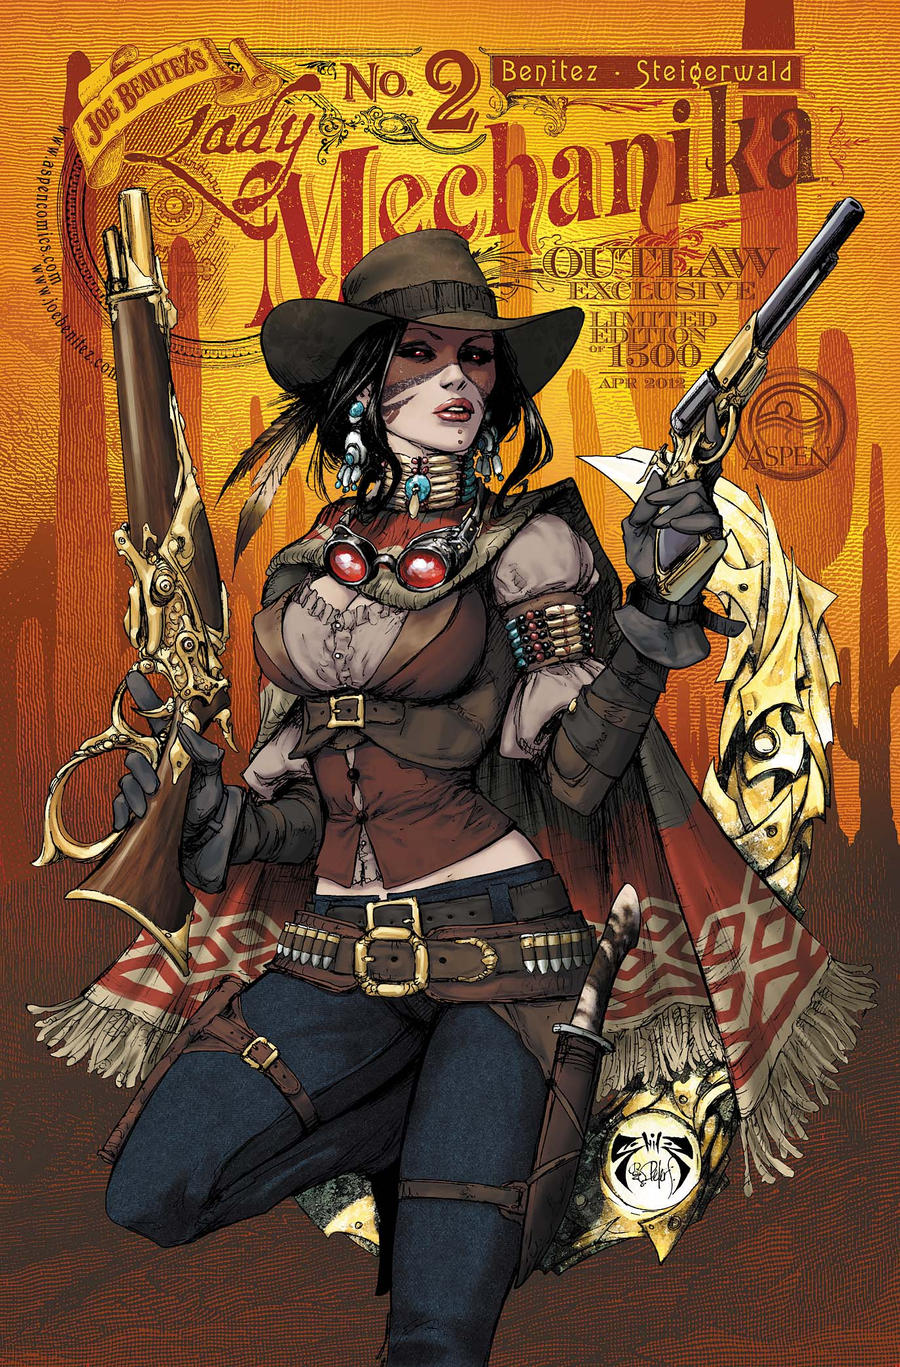 Outlaw by joebenitez